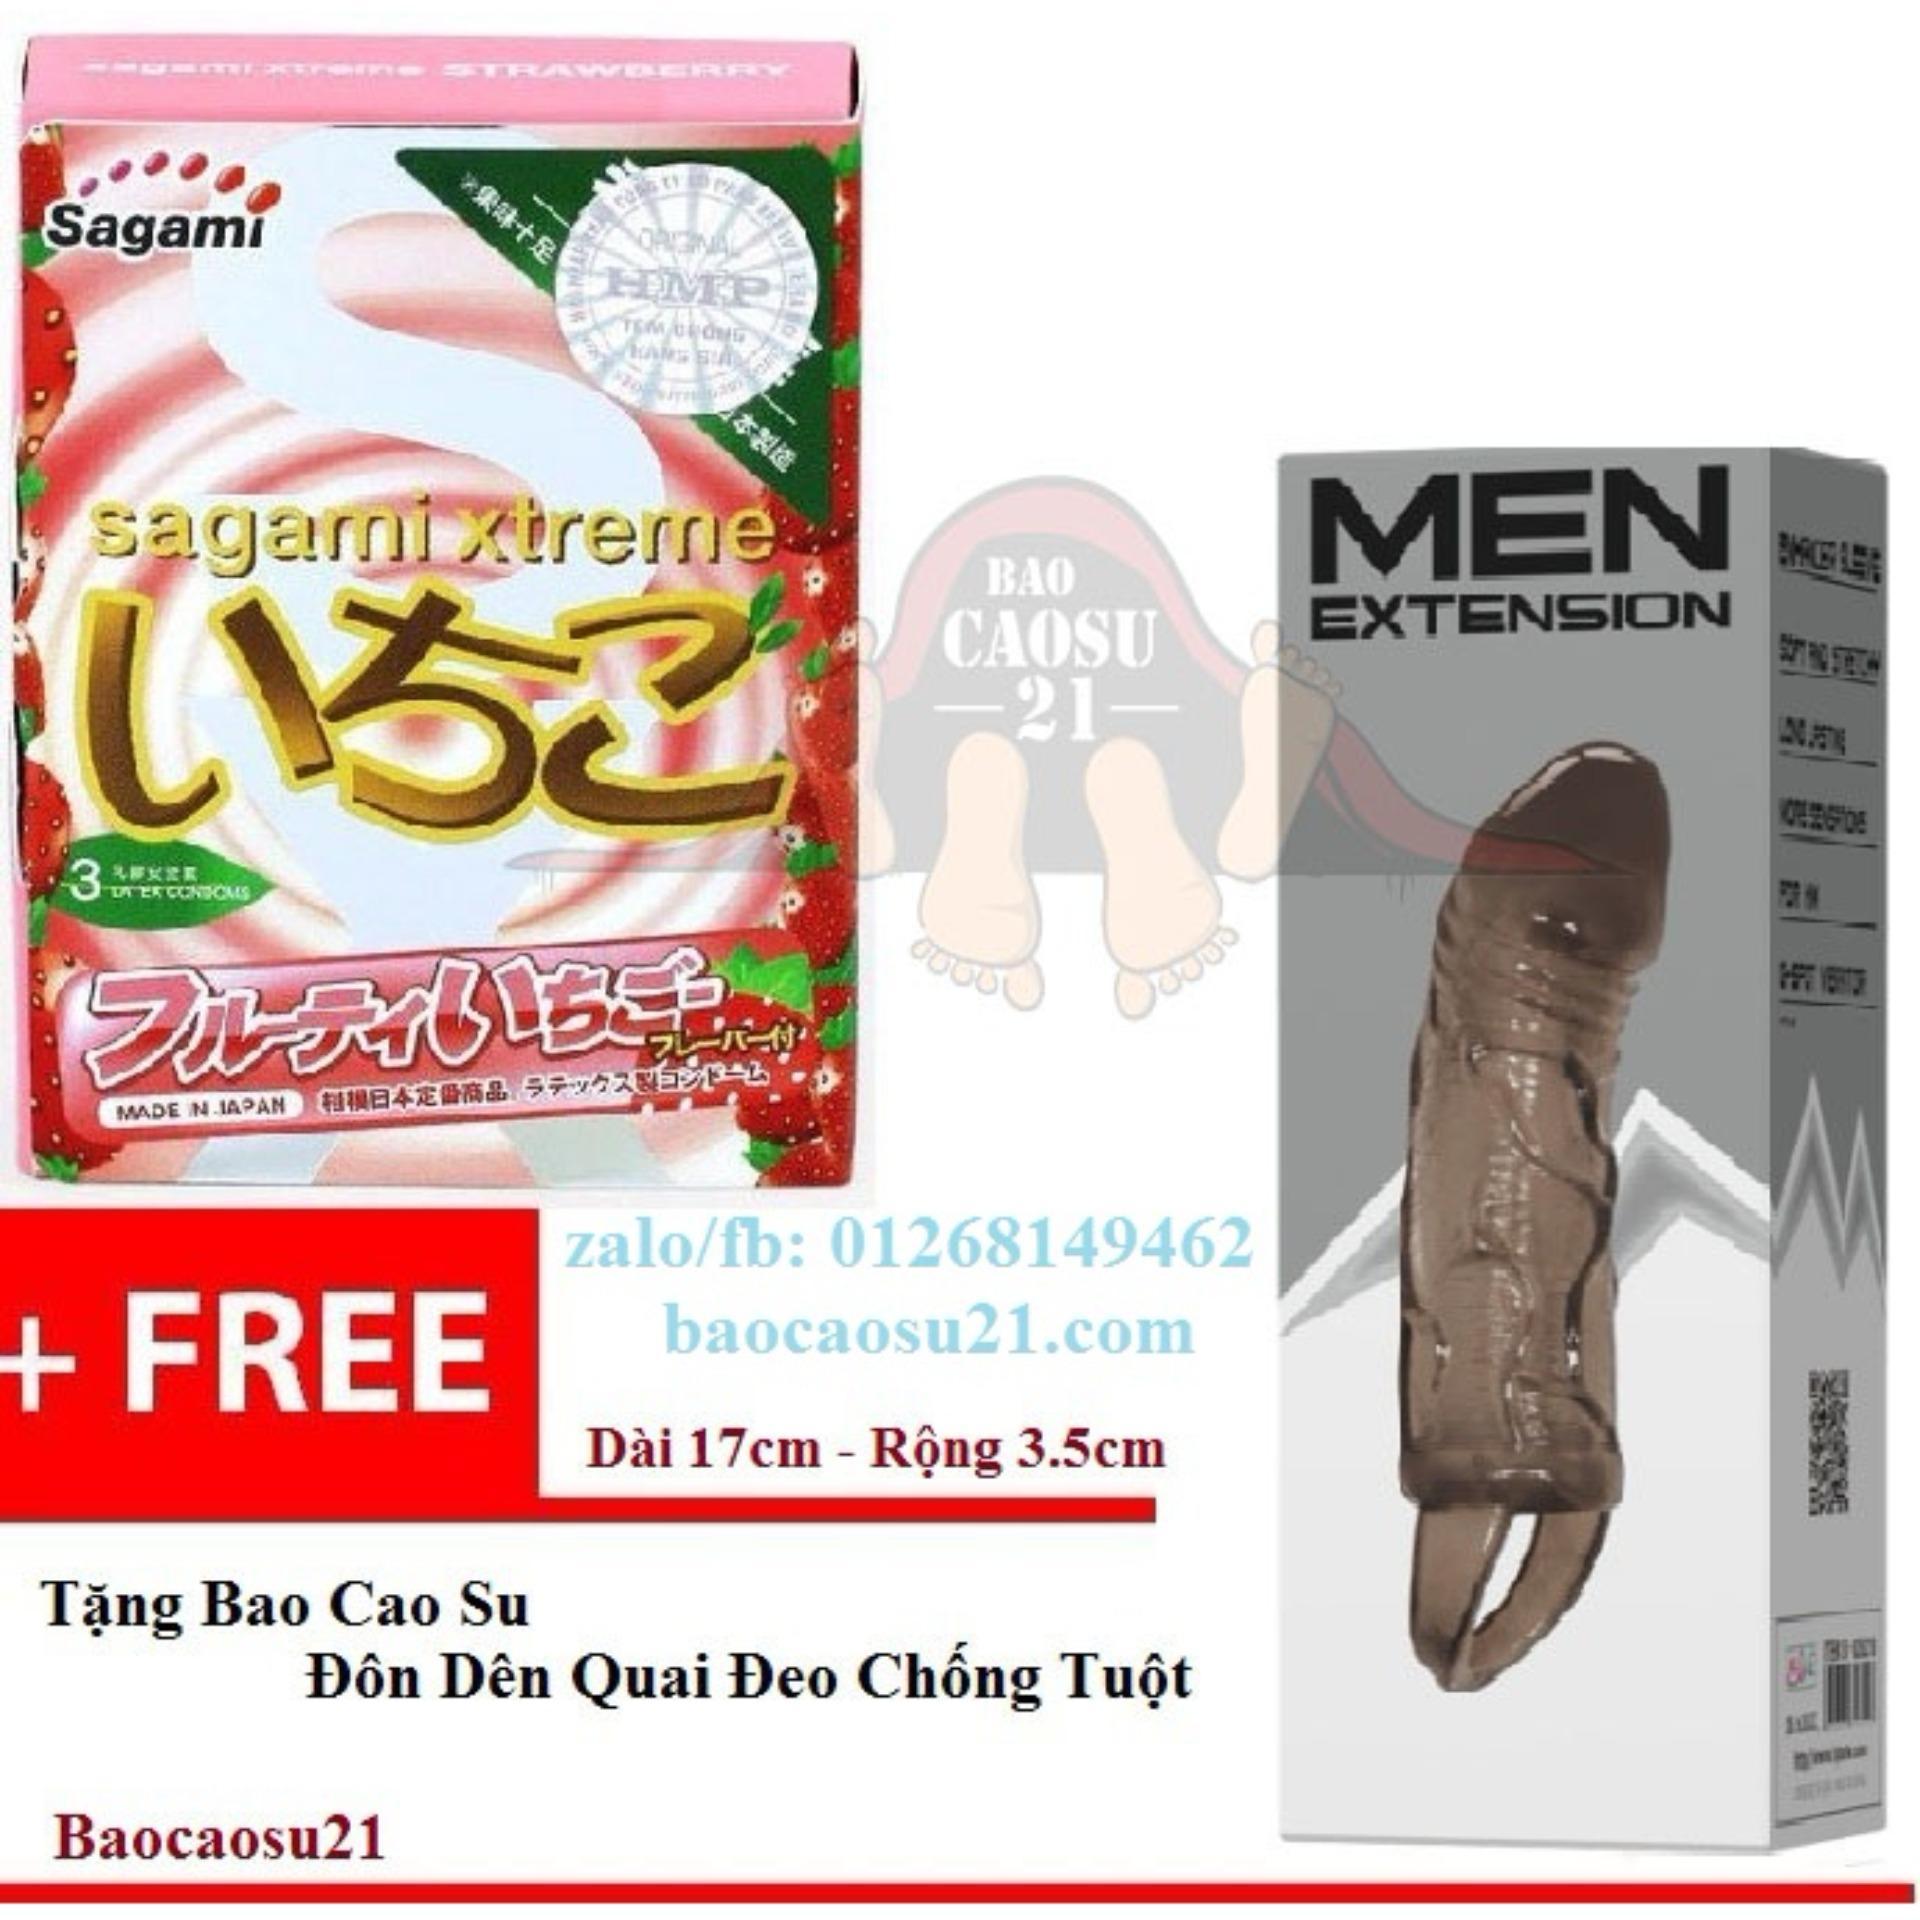 Mua Bcs21 Lovetoys Bao Cao Su Sagami Xtreme Strawberry Tặng Bao Cao Su Đon Den Quai Đeo Chống Tuột Rẻ Trong Hồ Chí Minh